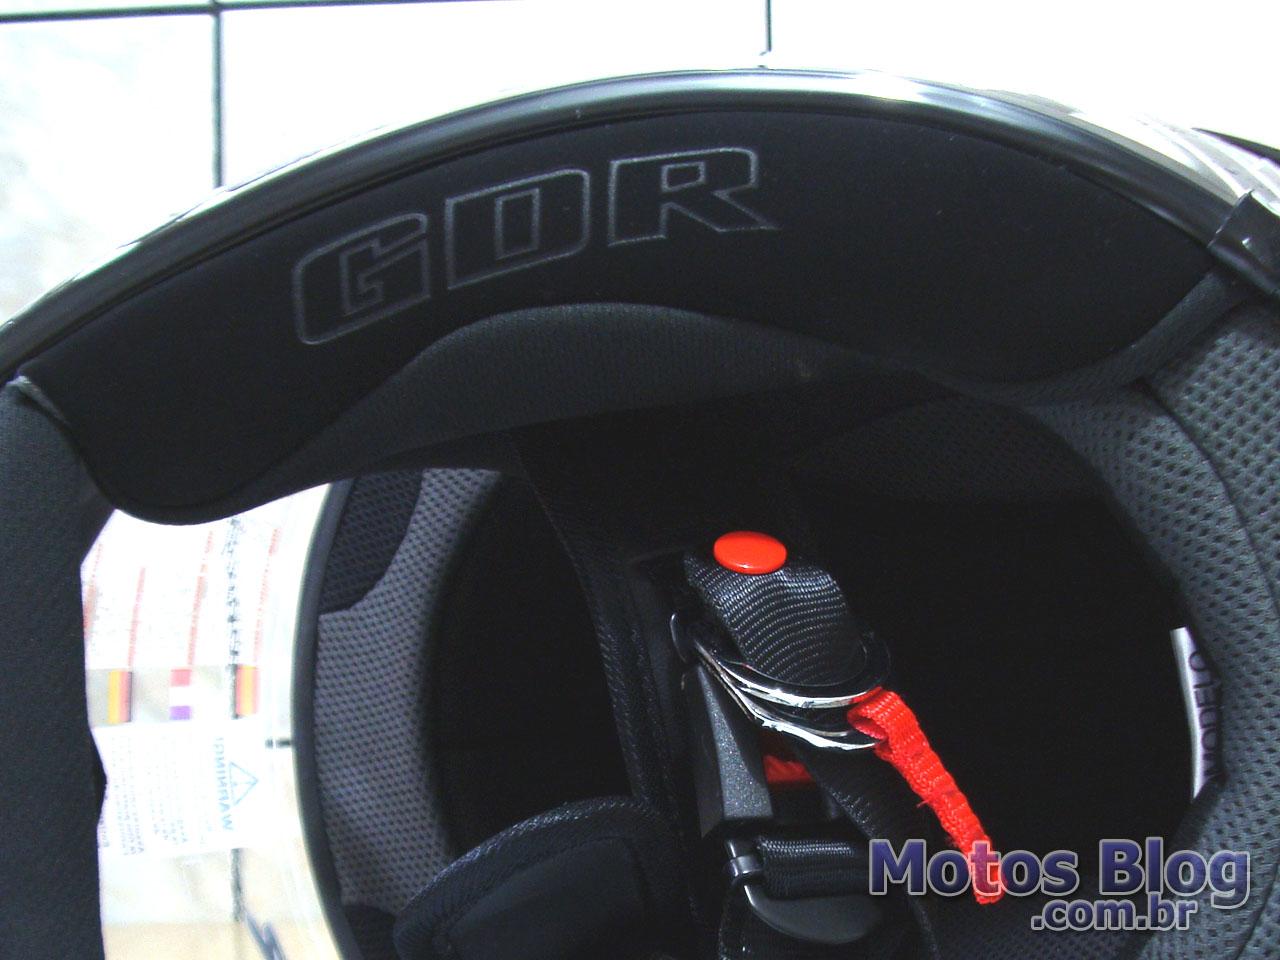 Bochecha do capacete